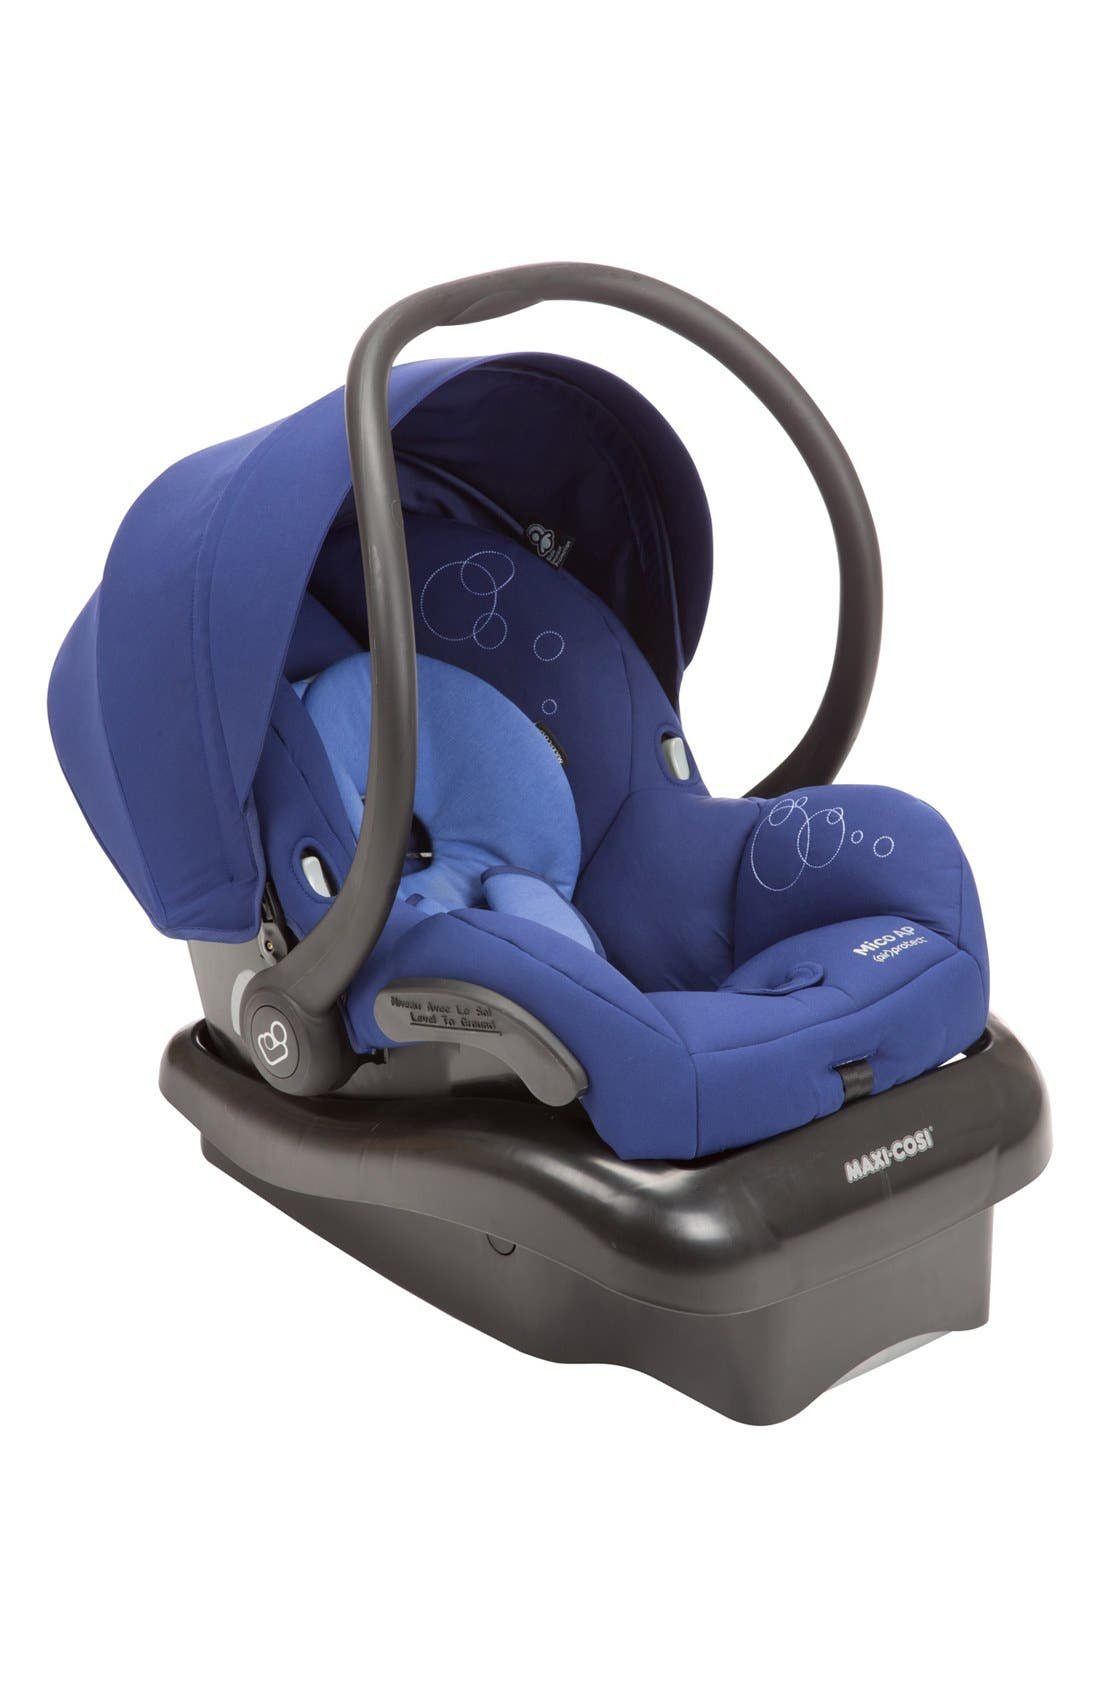 Mico AP Infant Car Seat & Base,                             Main thumbnail 5, color,